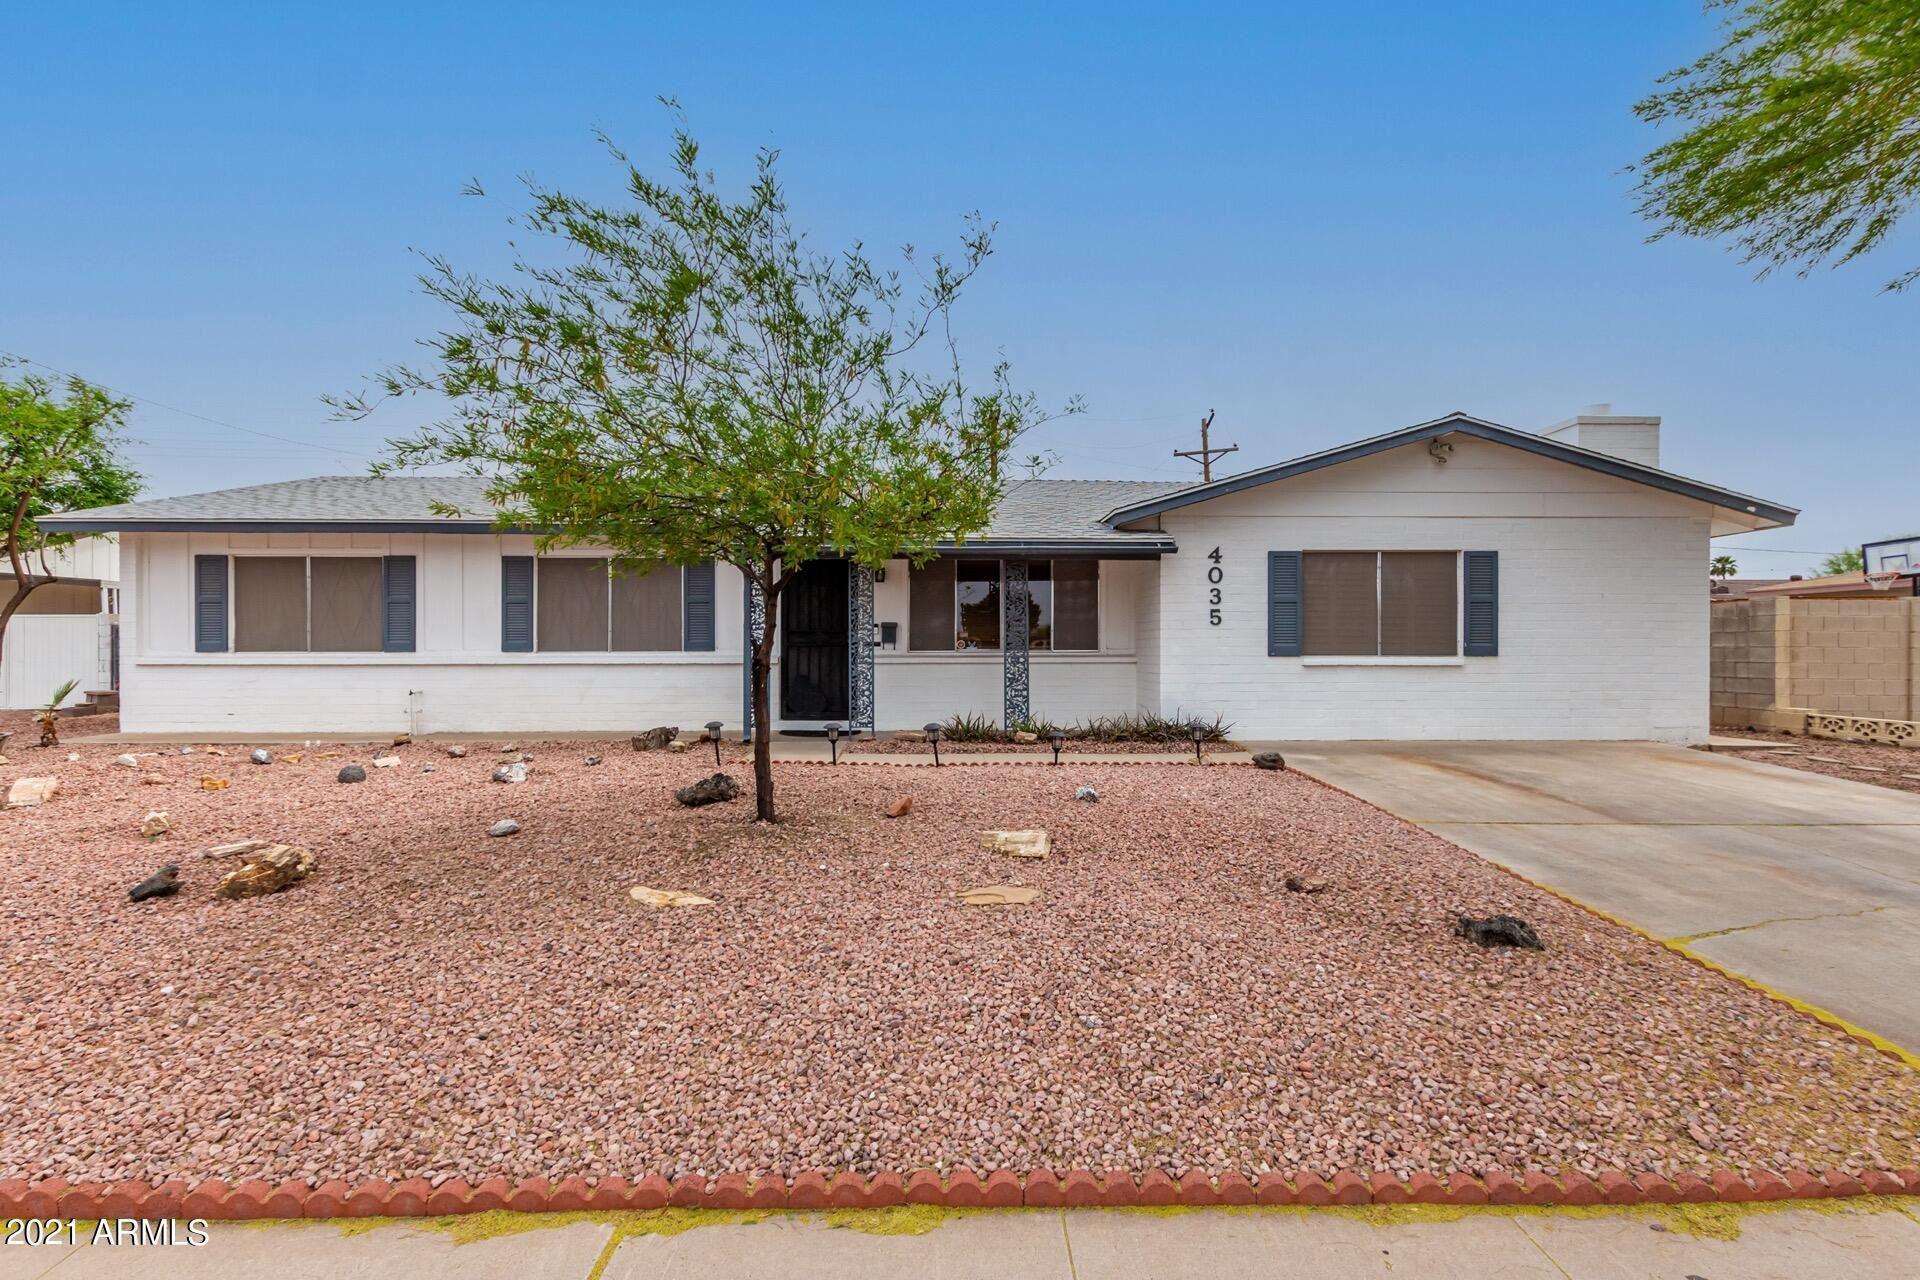 4035 W Orangewood Avenue, Phoenix, AZ 85051 - MLS#: 6231153